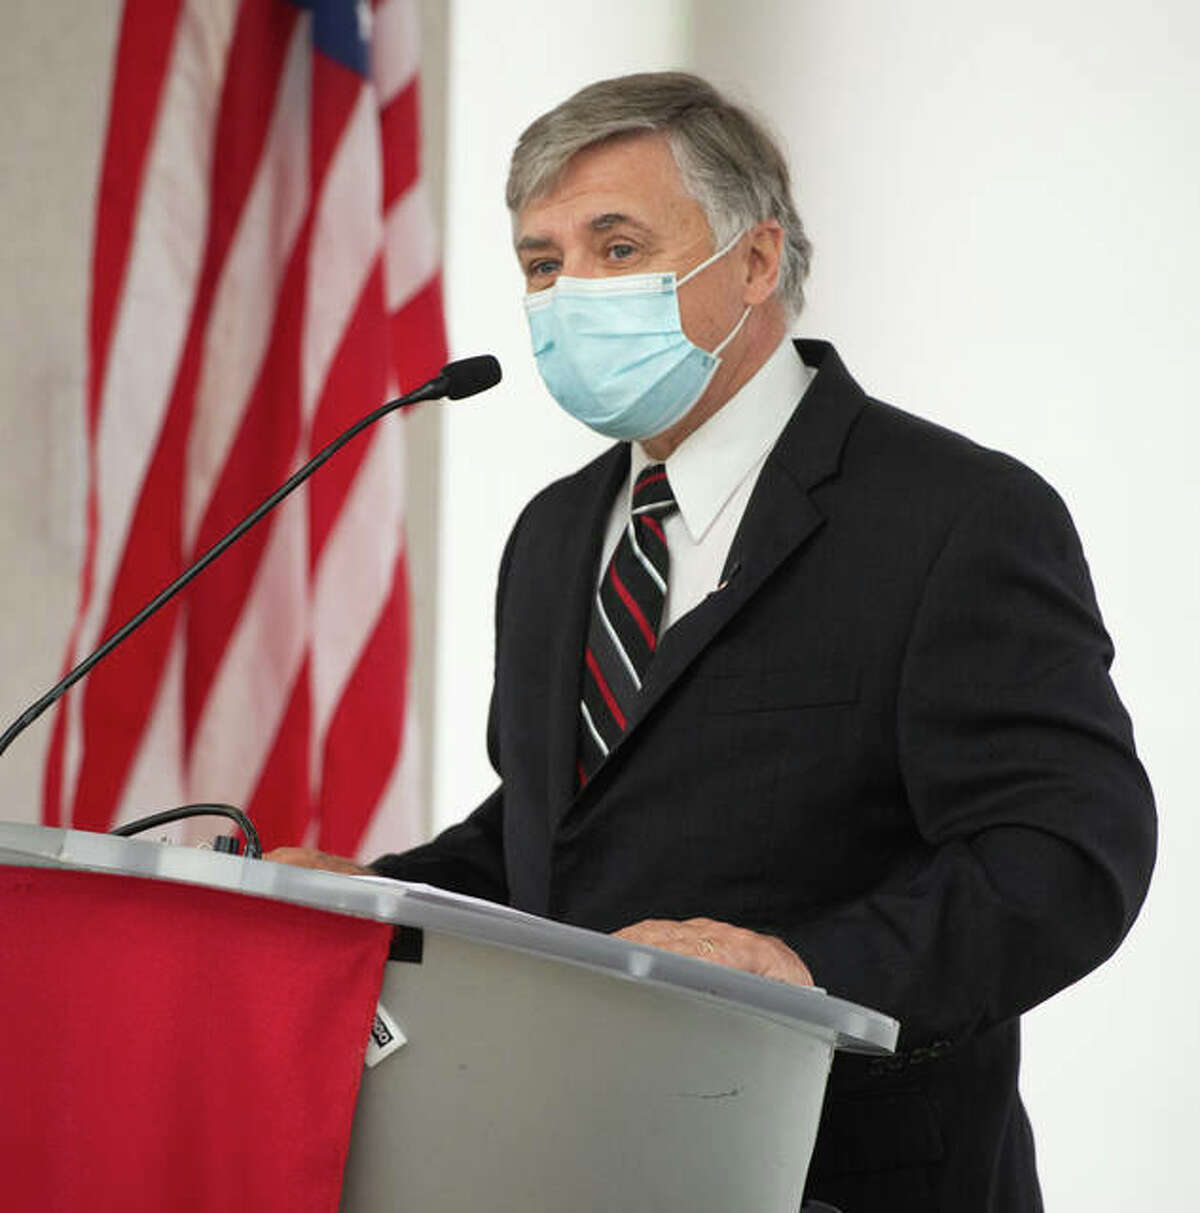 Southern Illinois University Edwardsville Chancellor Randy Pembrook centered his final University Address on Tuesday.